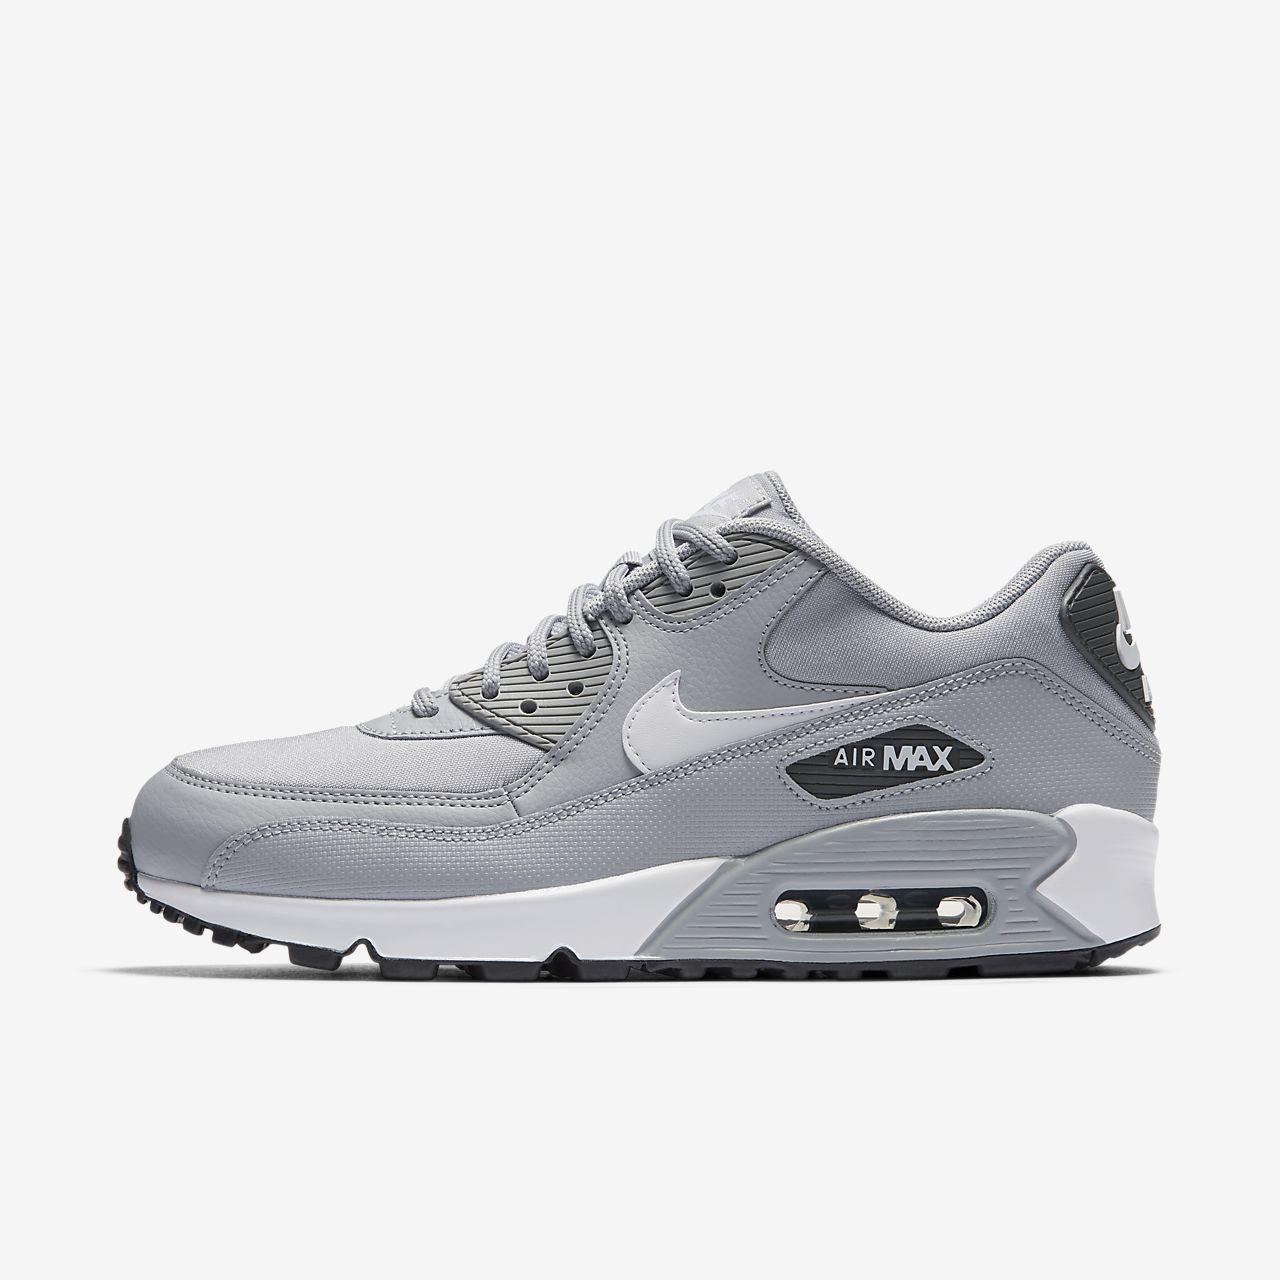 95013f2515b Nike Air Max 90 Women s Shoe